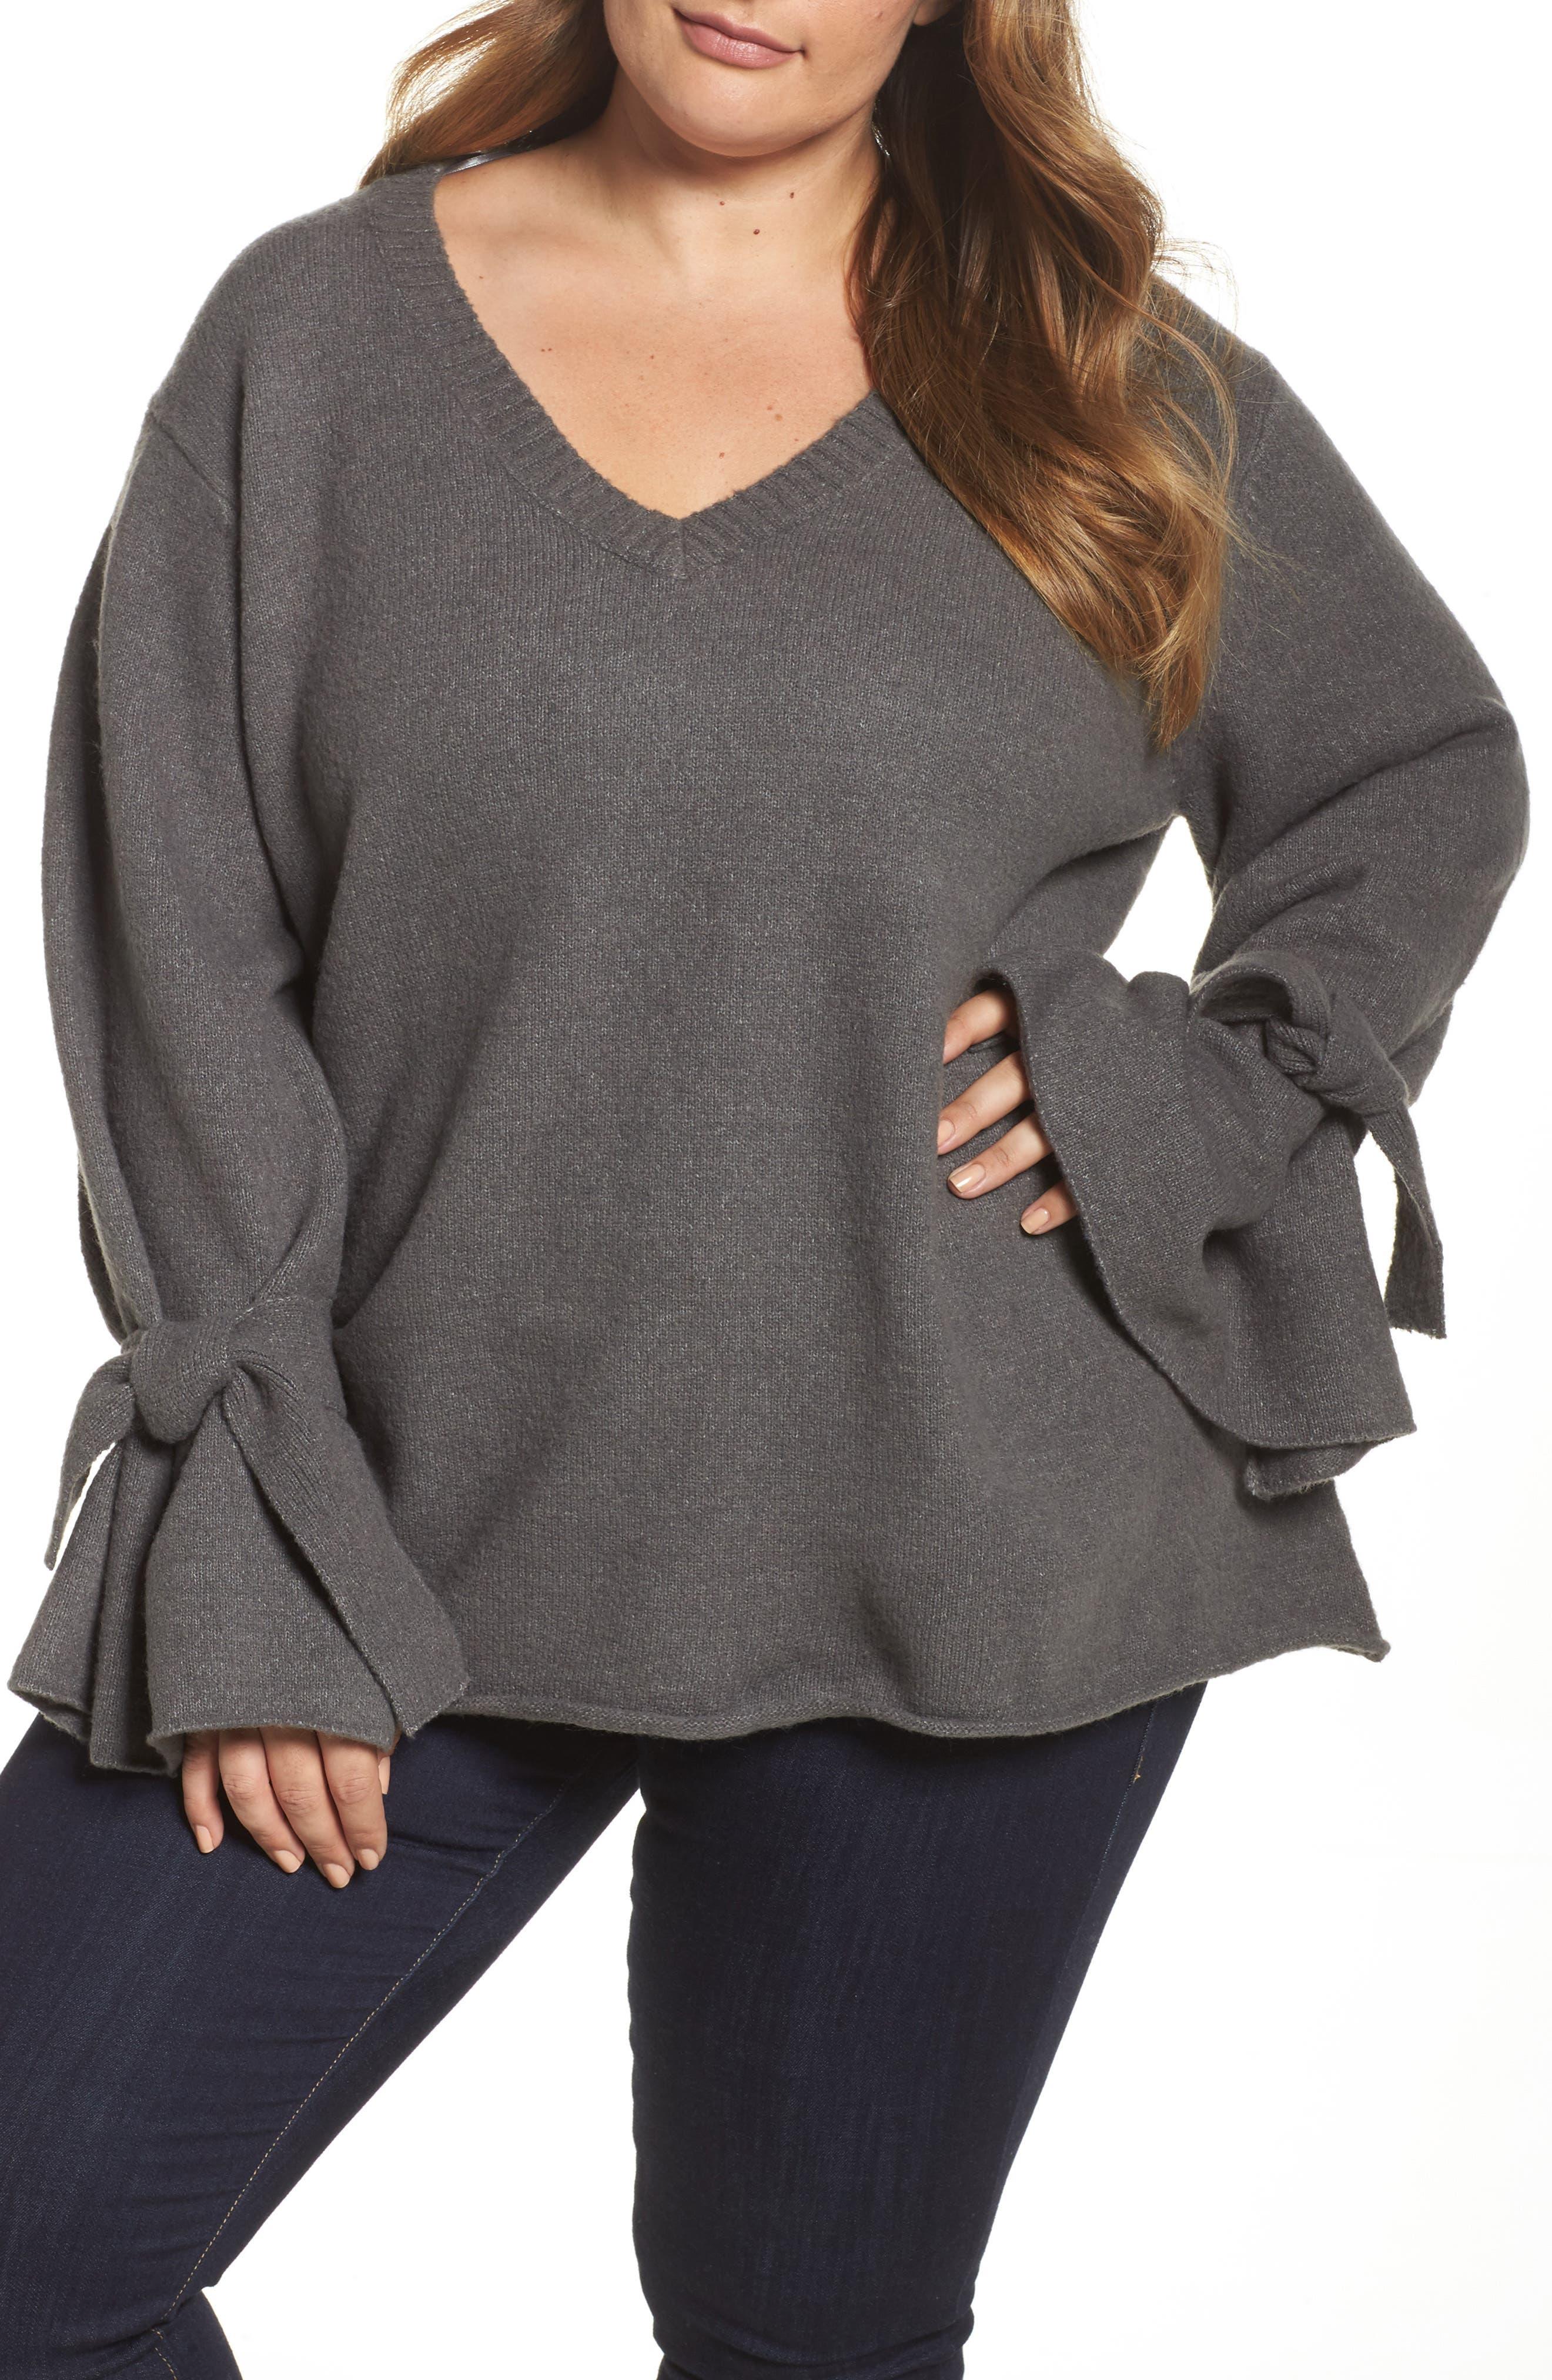 Alternate Image 1 Selected - Glamorous Tie Sleeve Sweater (Plus Size)